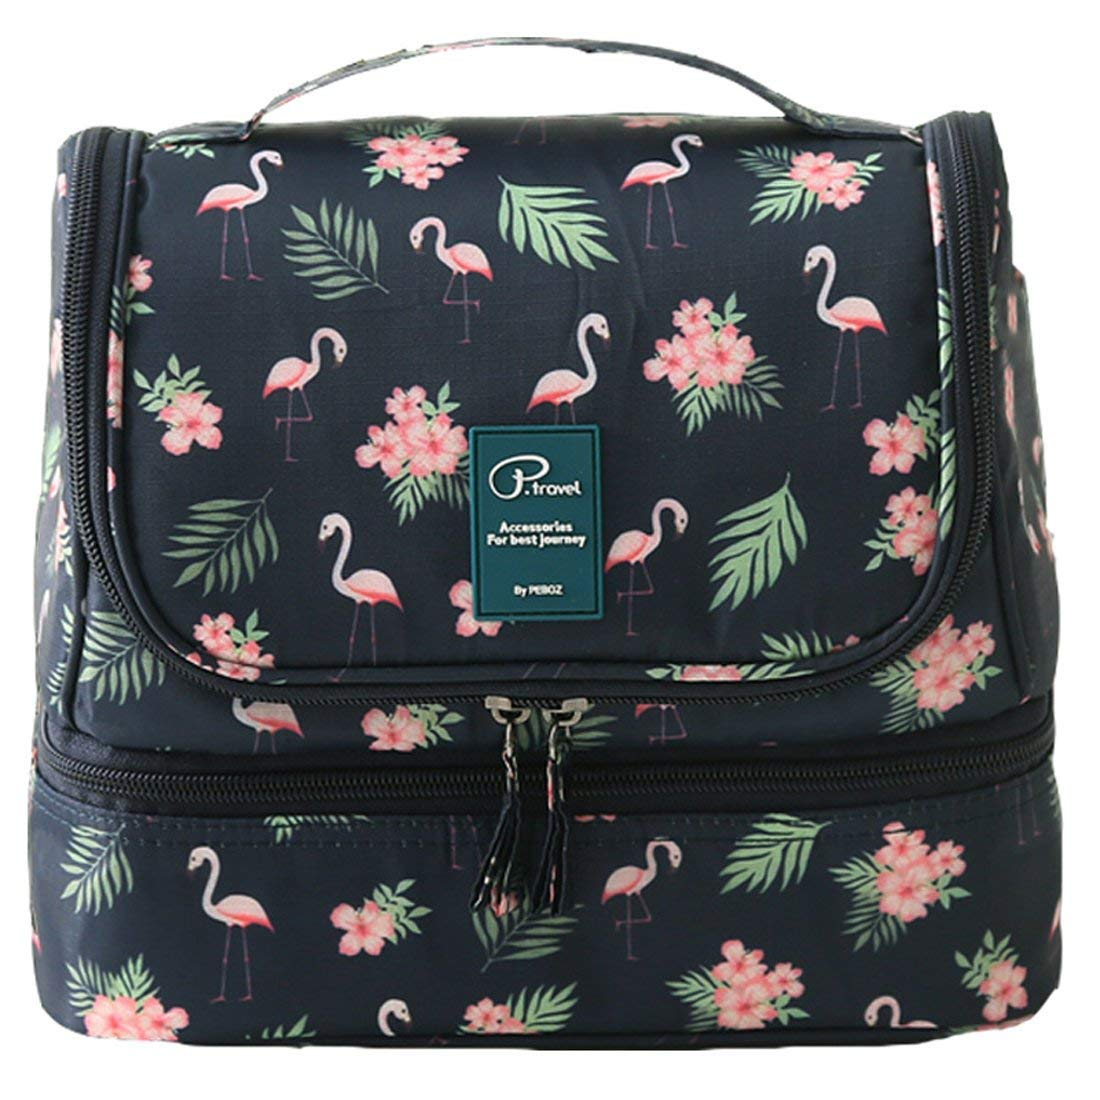 MJFOX Toiletry Washer Bag, wash Bag Women Ladies Cosmetic Bag Flamingo Makeup Bag Toiletry Bag for Hanging Beauty case Cosmetic Bag